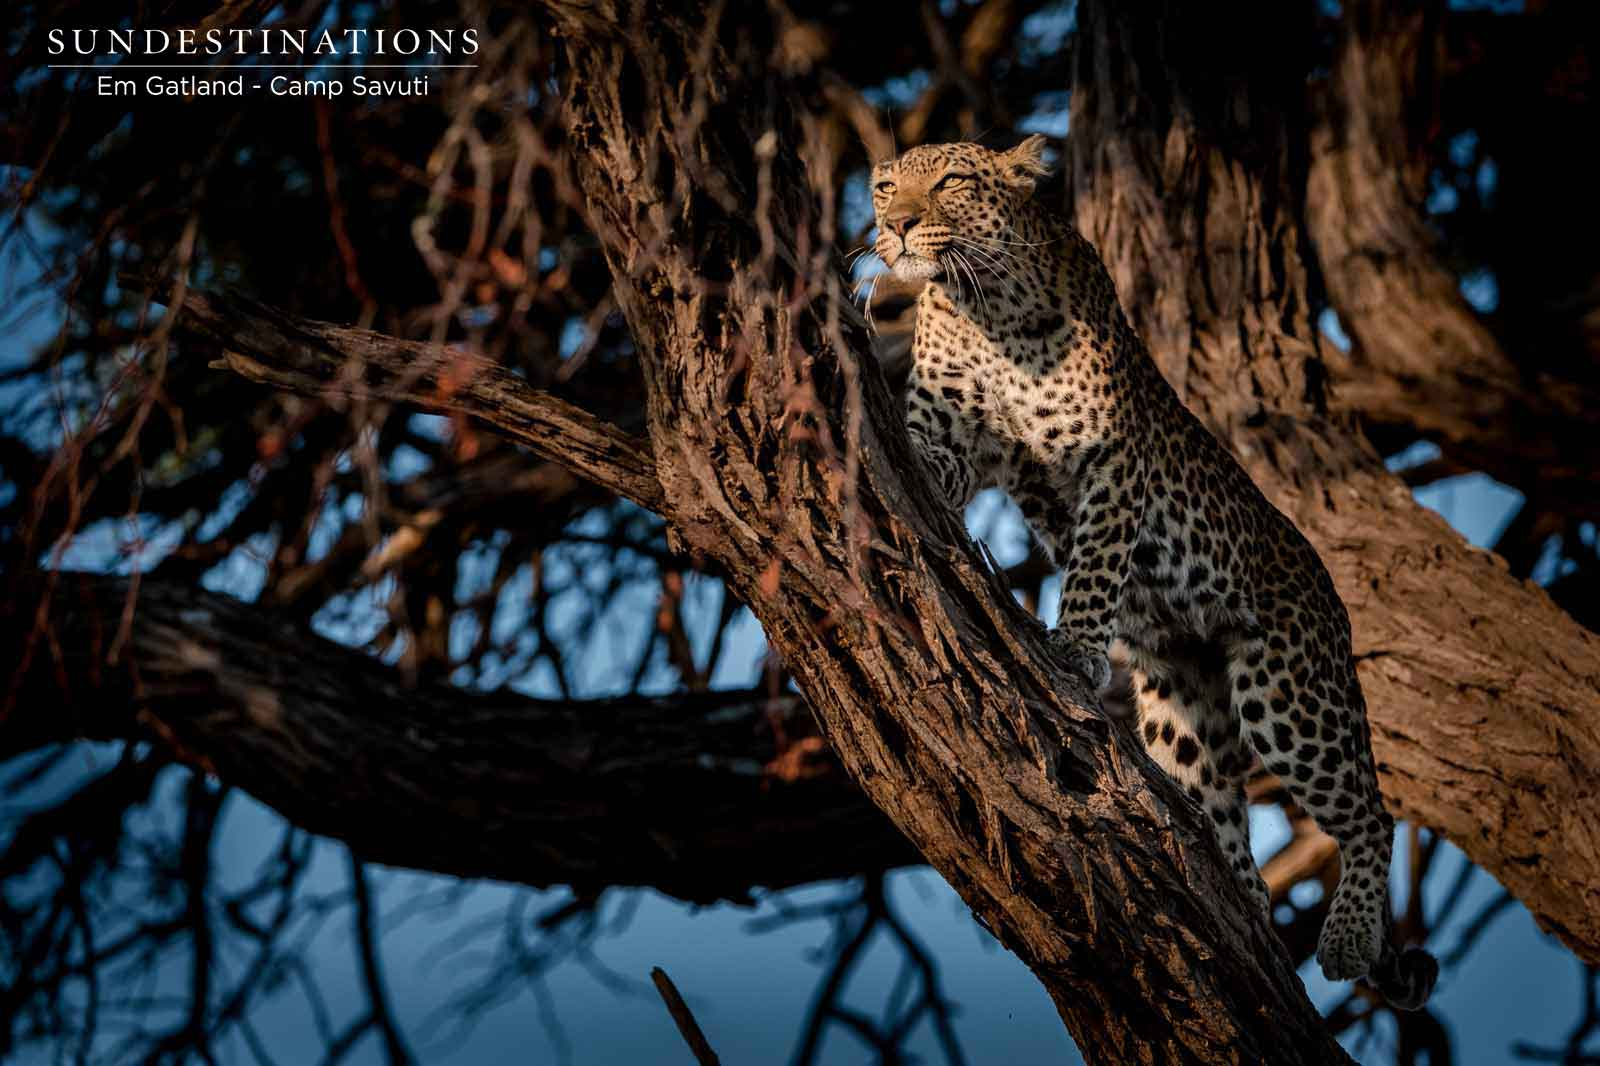 Leopard Watching Over Wilderness